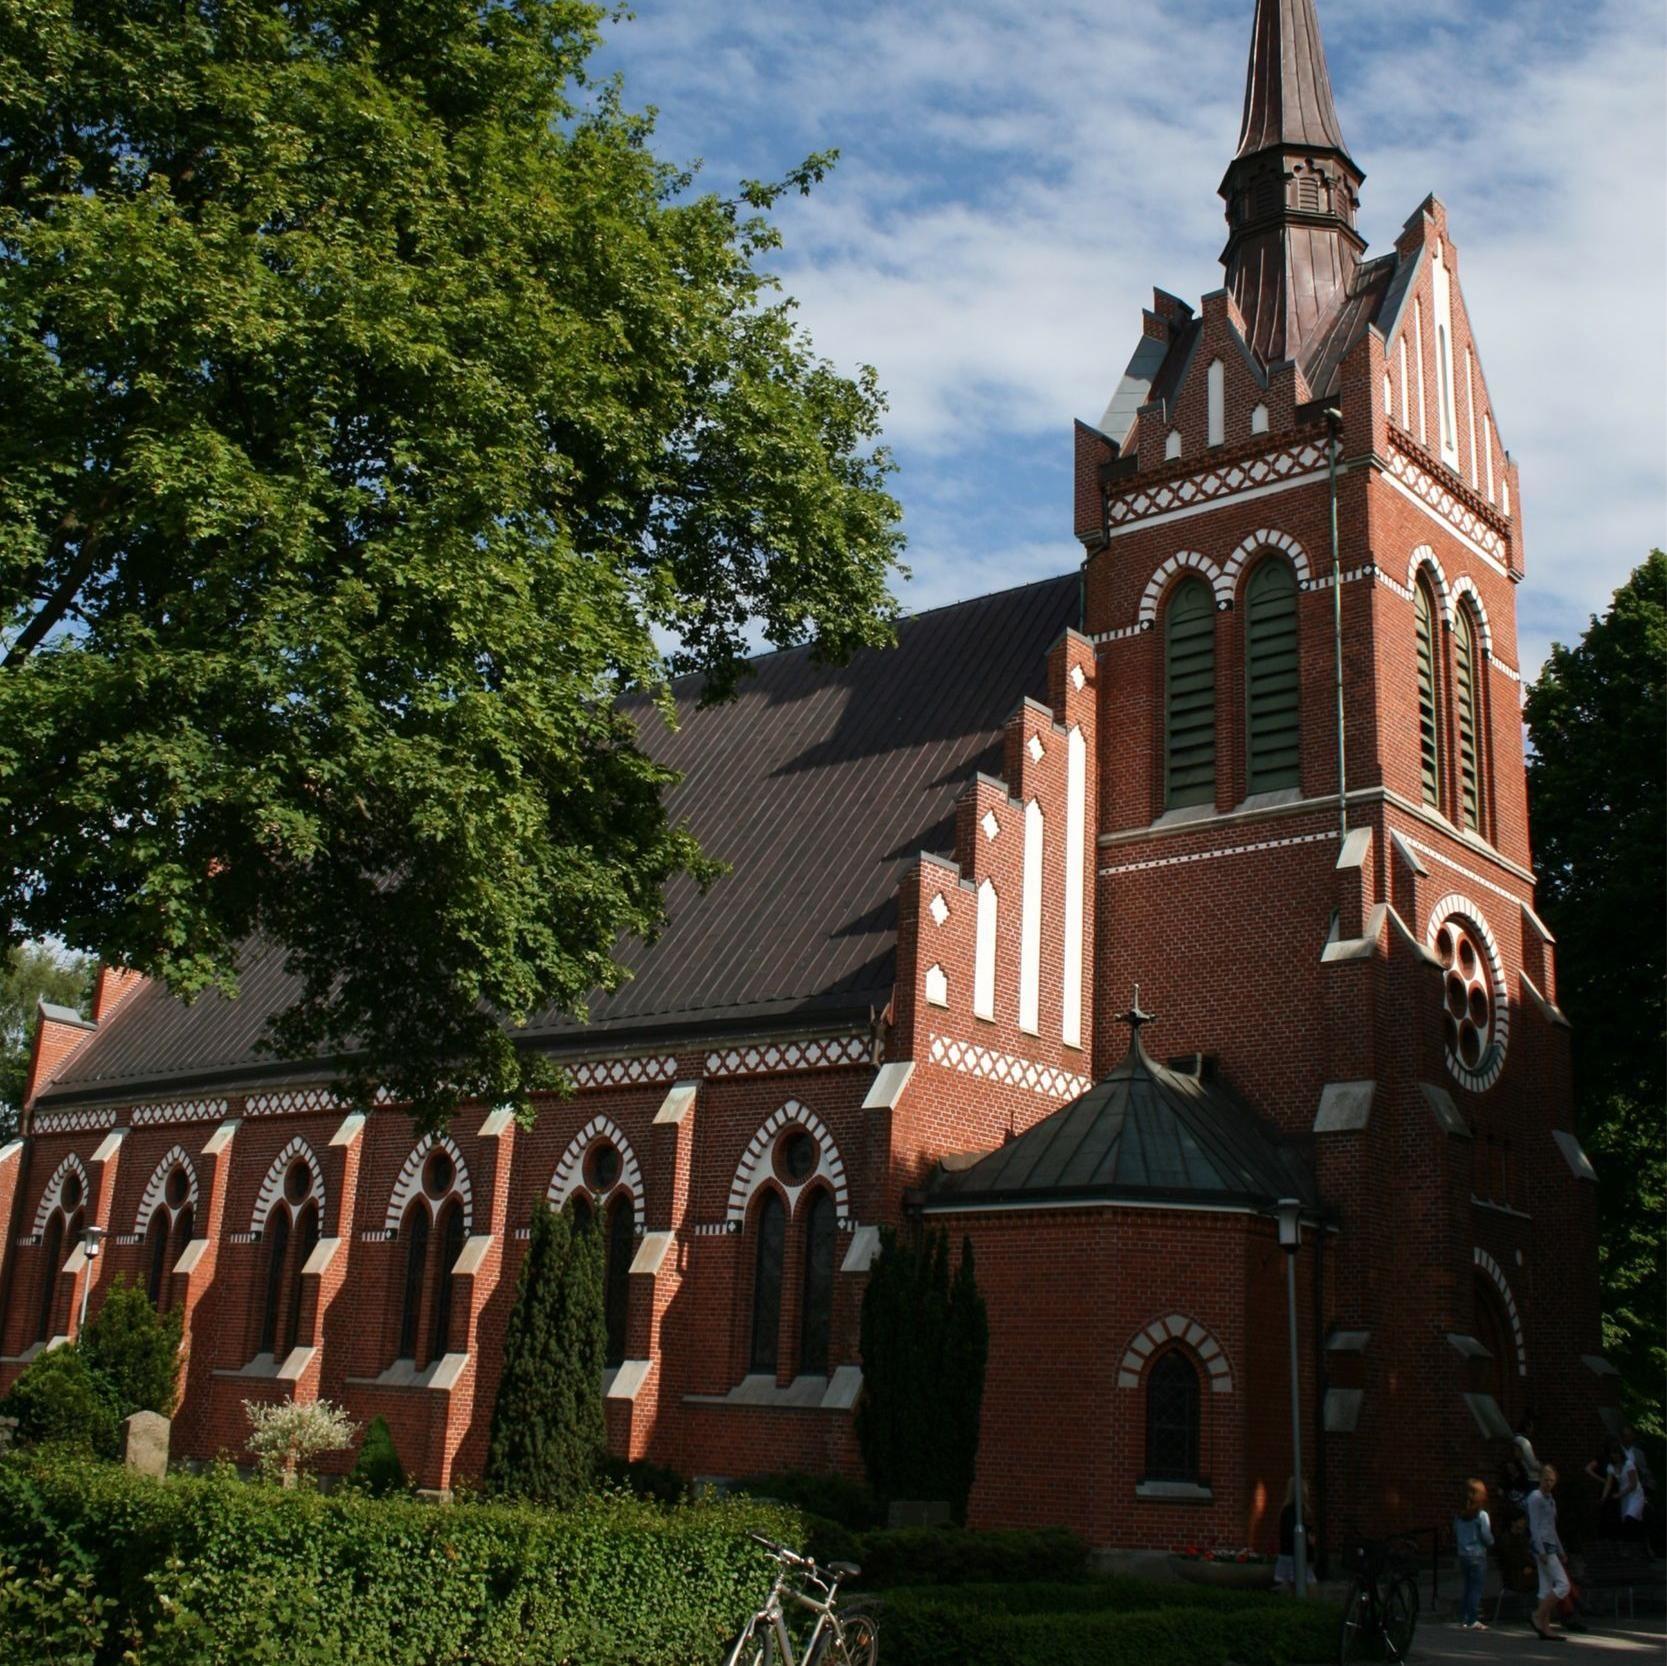 Korsbacka church